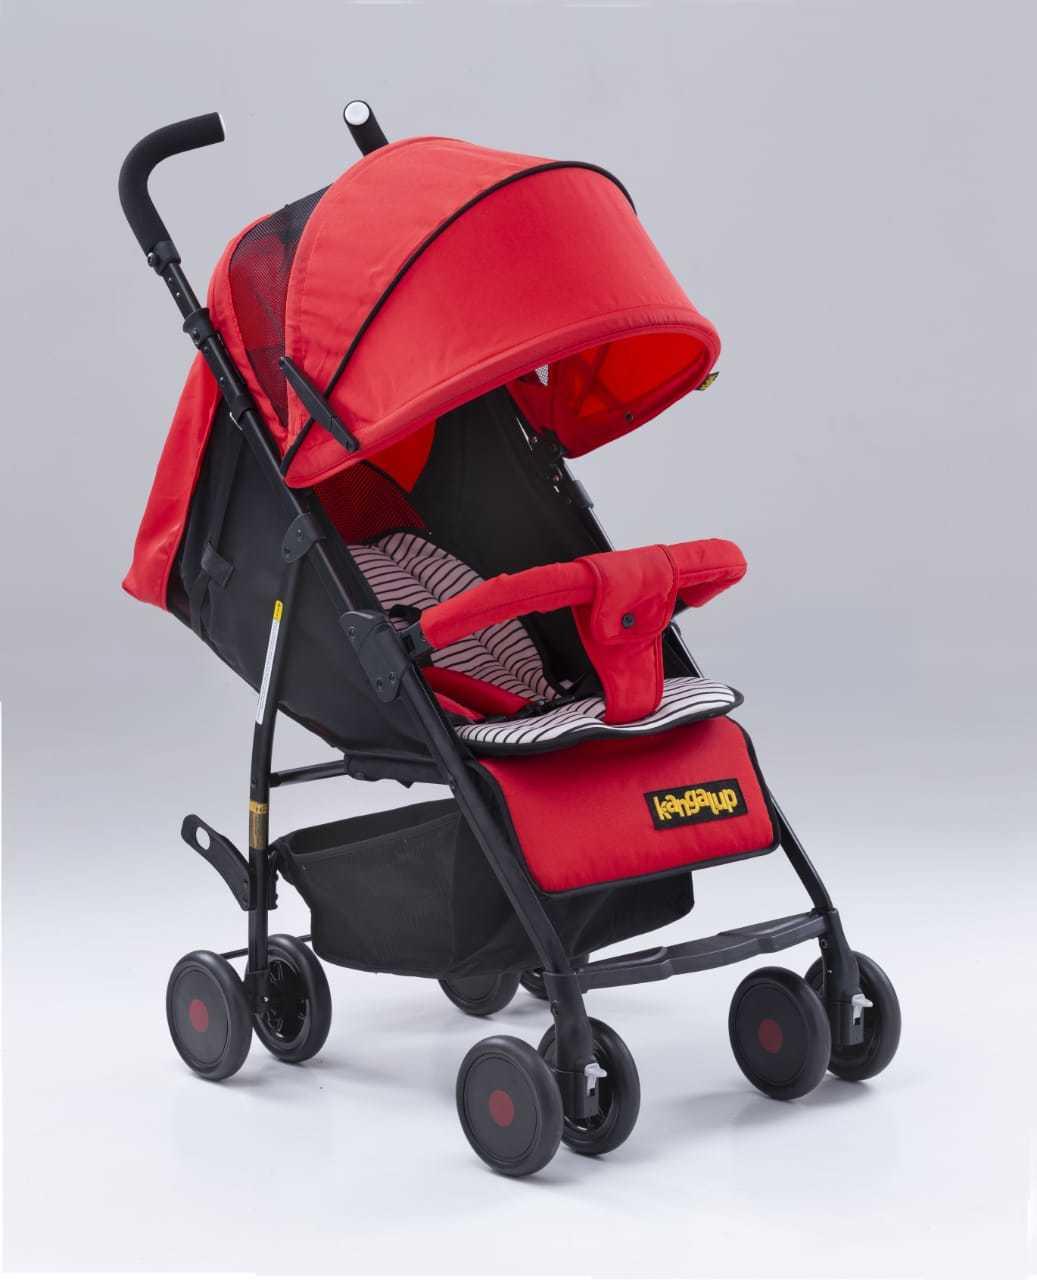 Carrinho de Bebê modelo x1  Kangalup